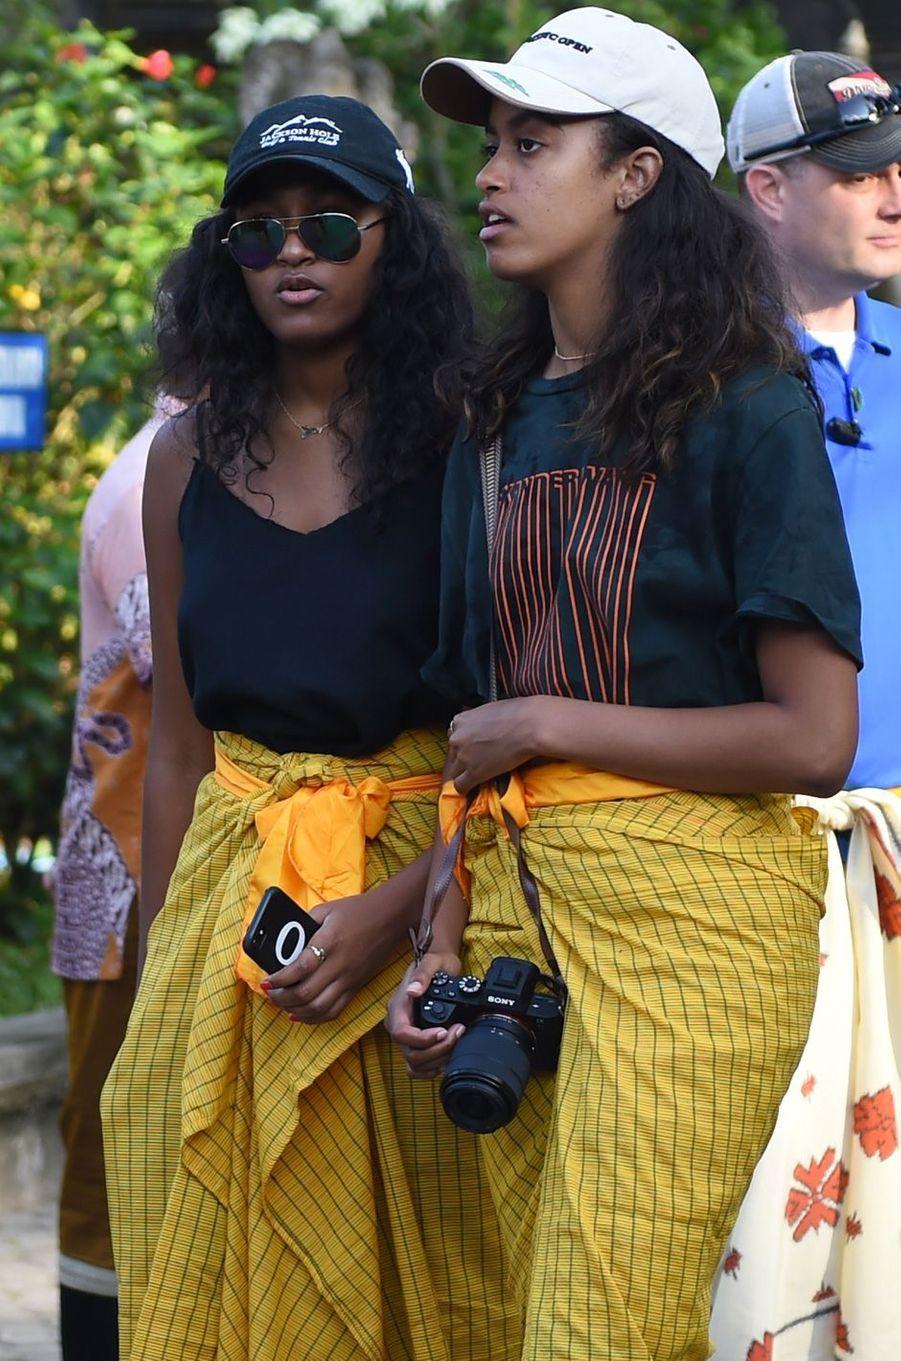 Sasha et Malia Obamavisitant le templedeTirta Empul en Indonésie, le 27 juin 2017.